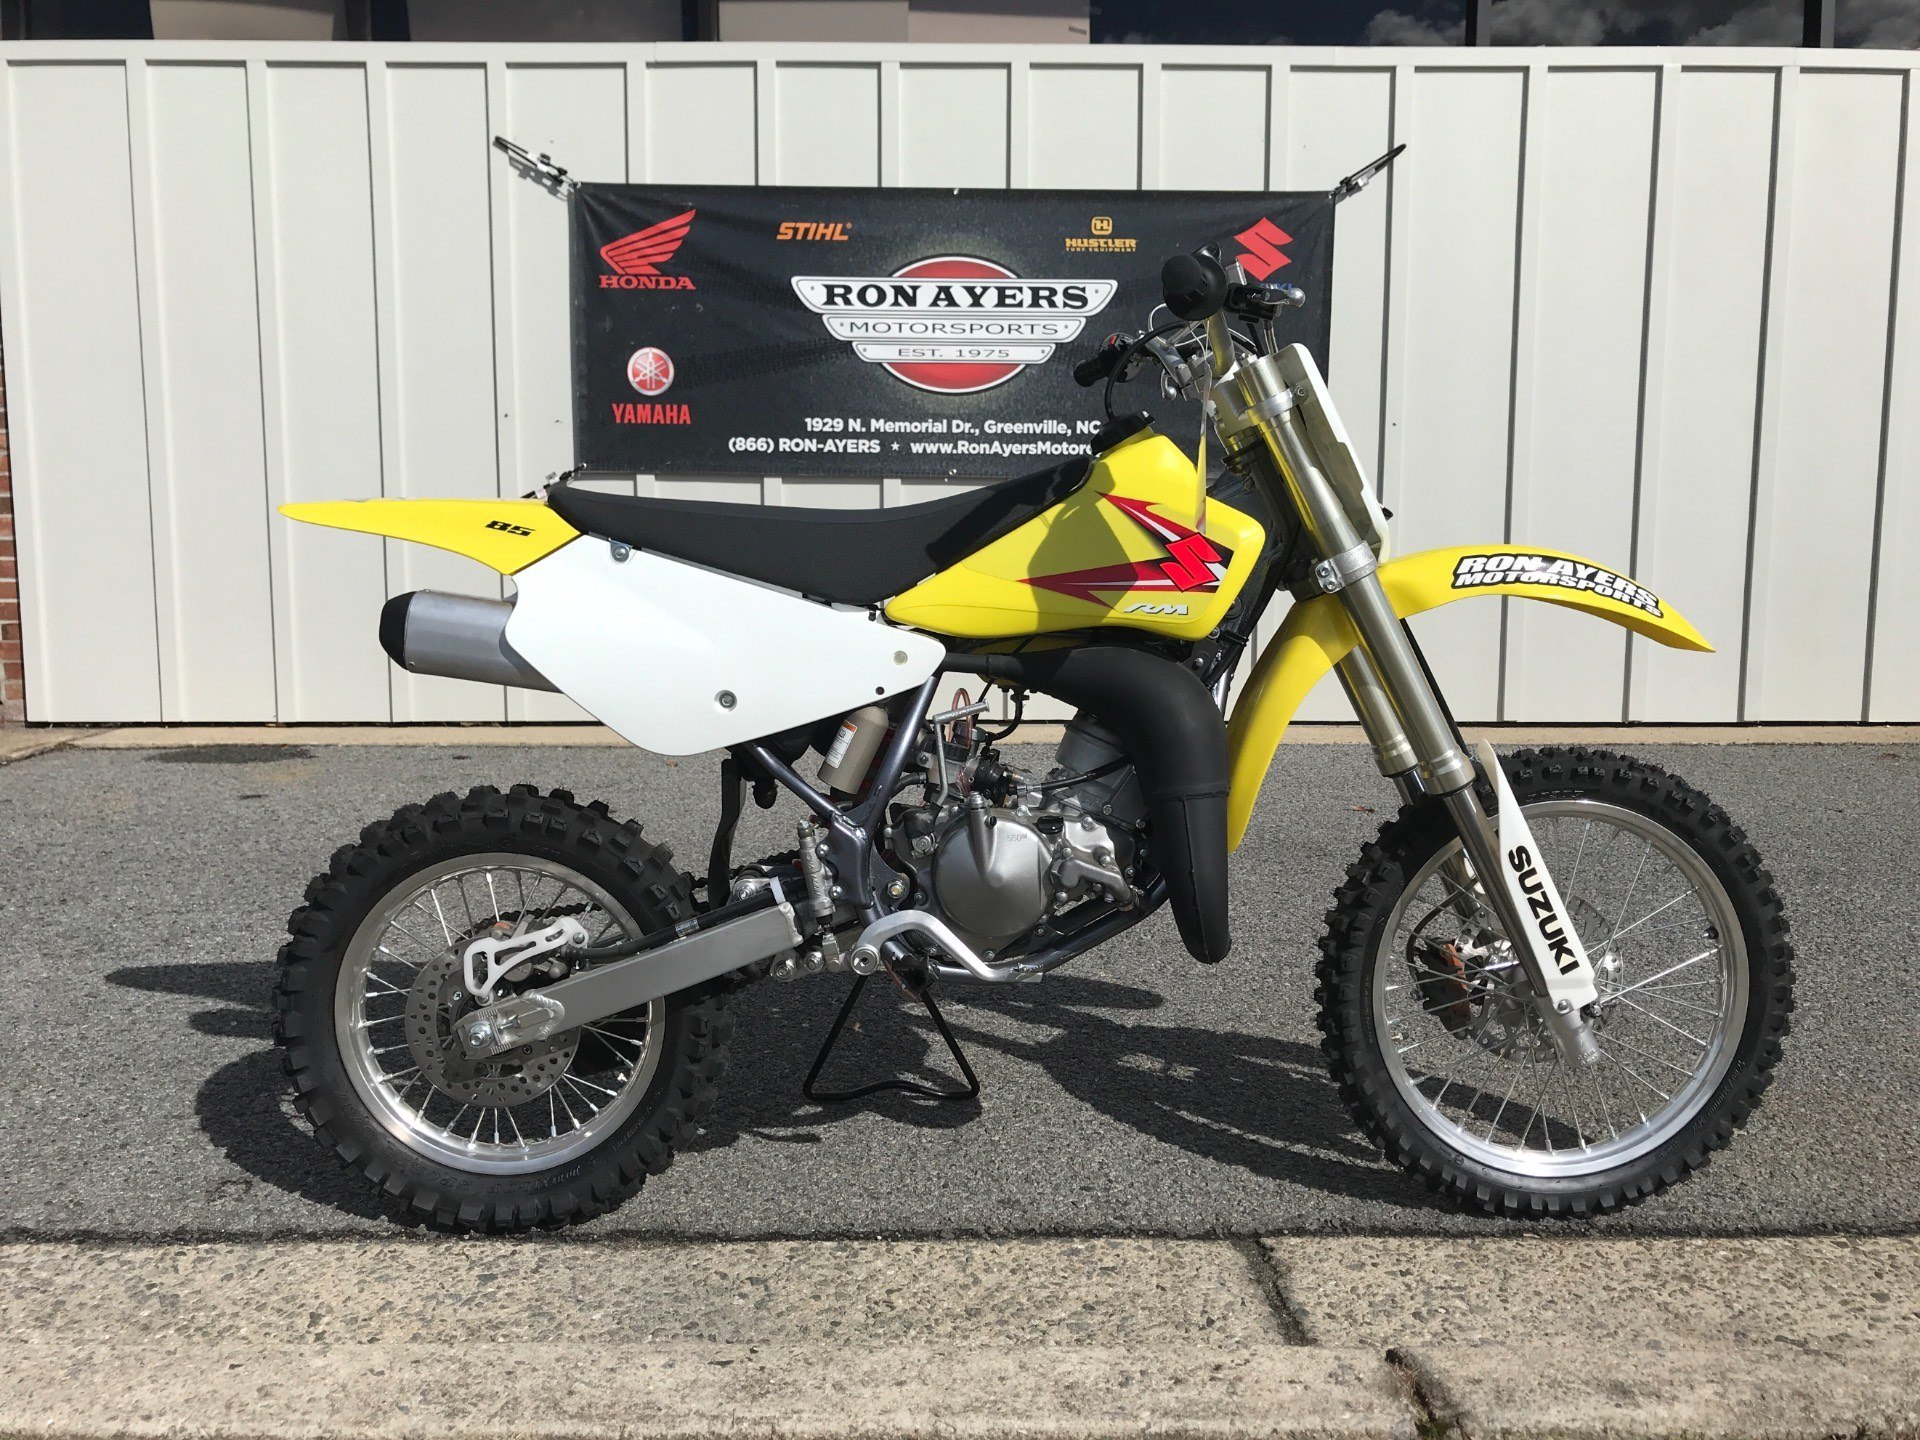 New 2015 Suzuki RM85 Motorcycles in Greenville NC